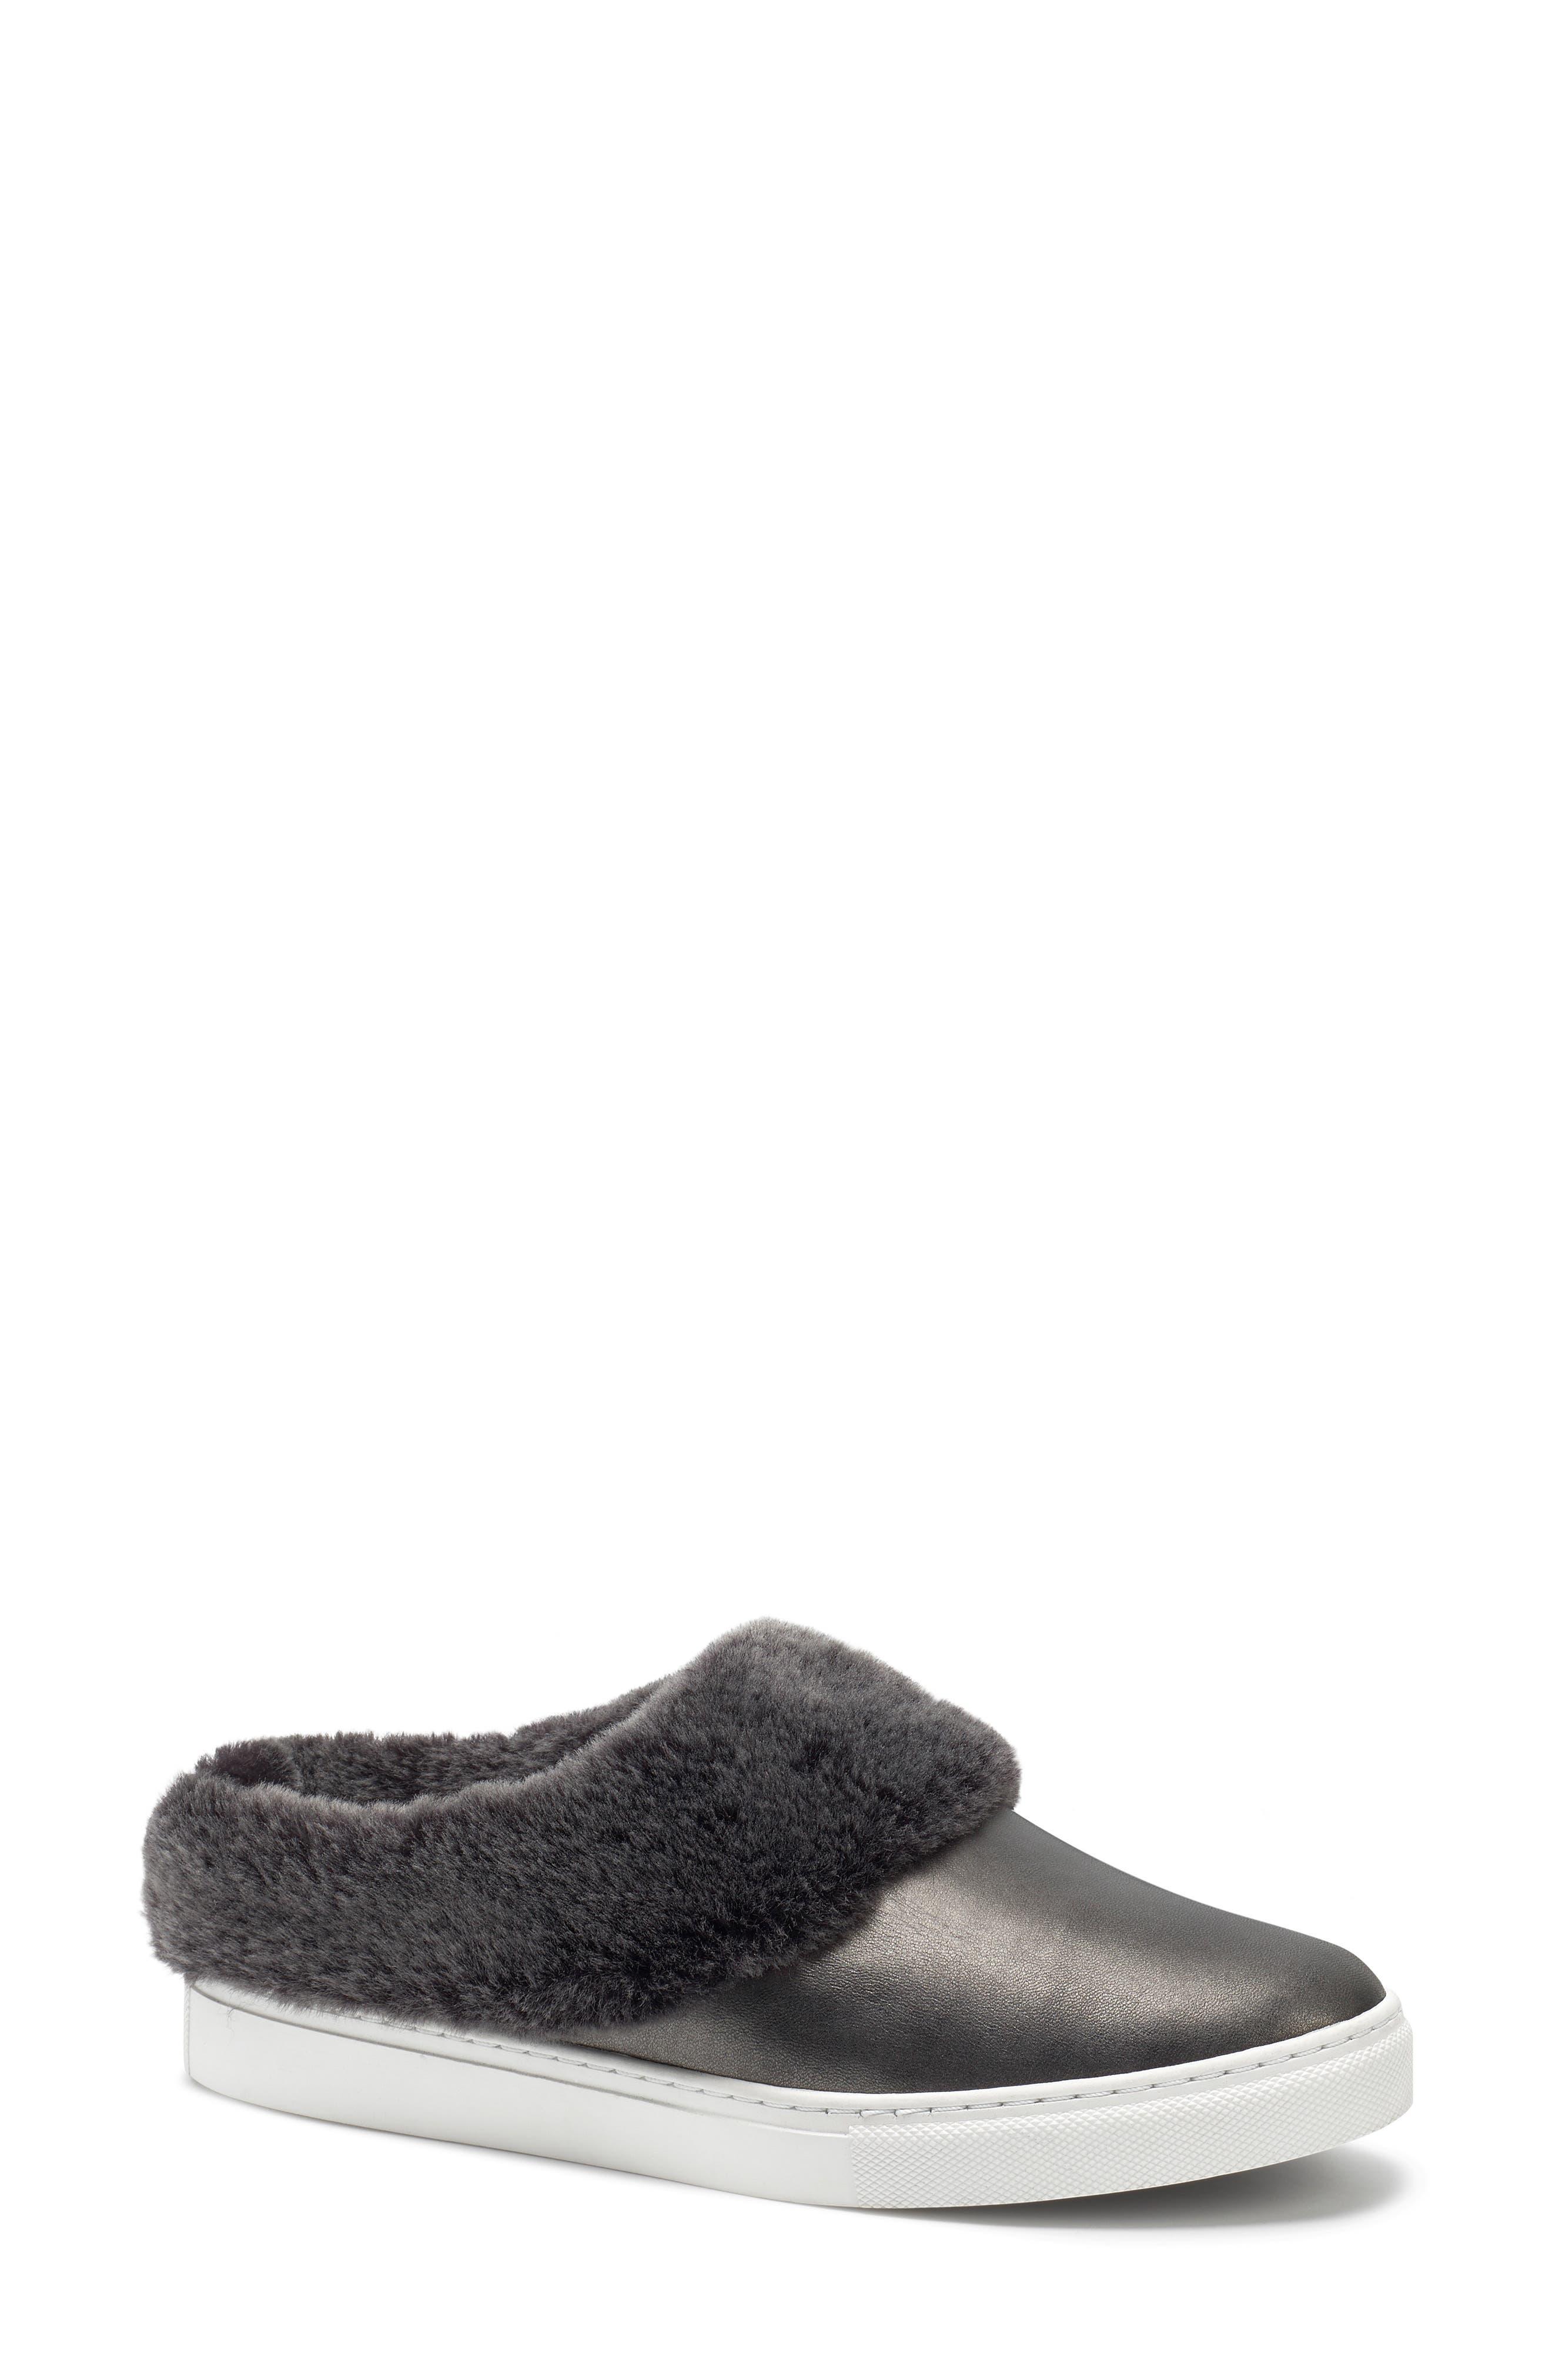 Trask Lisa Genuine Shearling Trim Slip-On Sneaker, Metallic